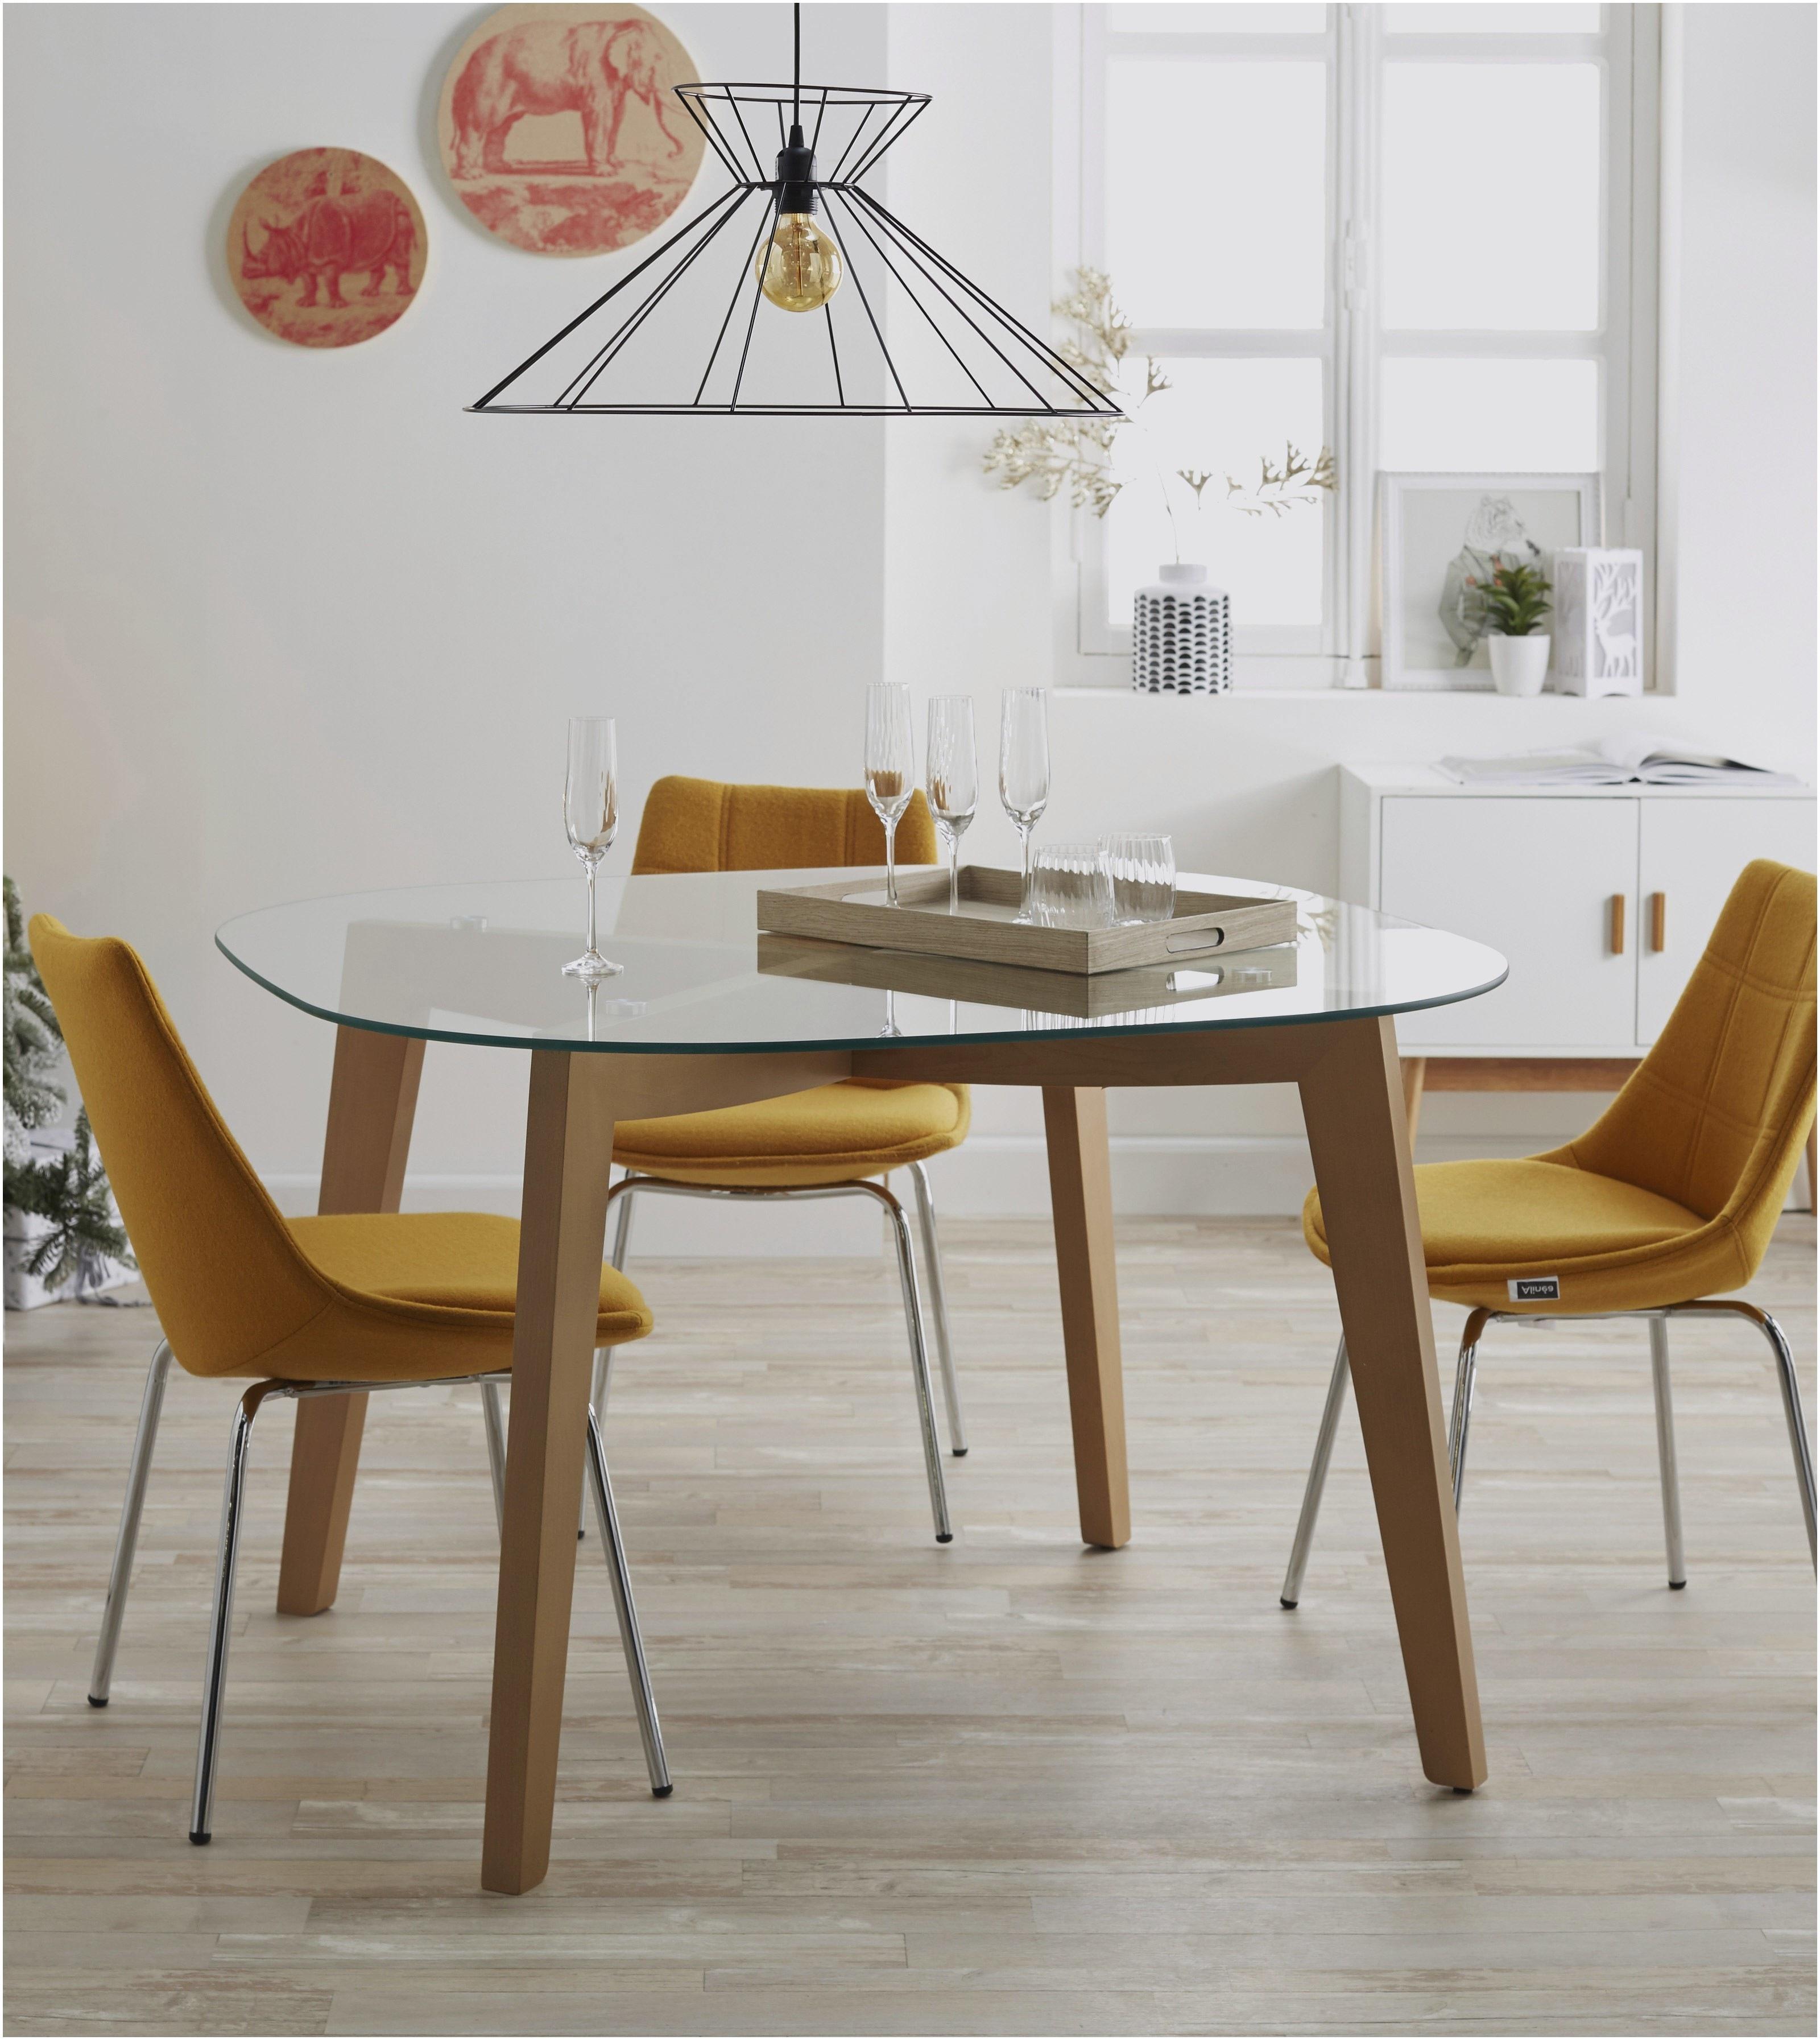 Table Pliante Carrefour Impressionnant Photos Table Pliante Carrefour Luxe Table Et Chaise Pliante Chaise Pliante